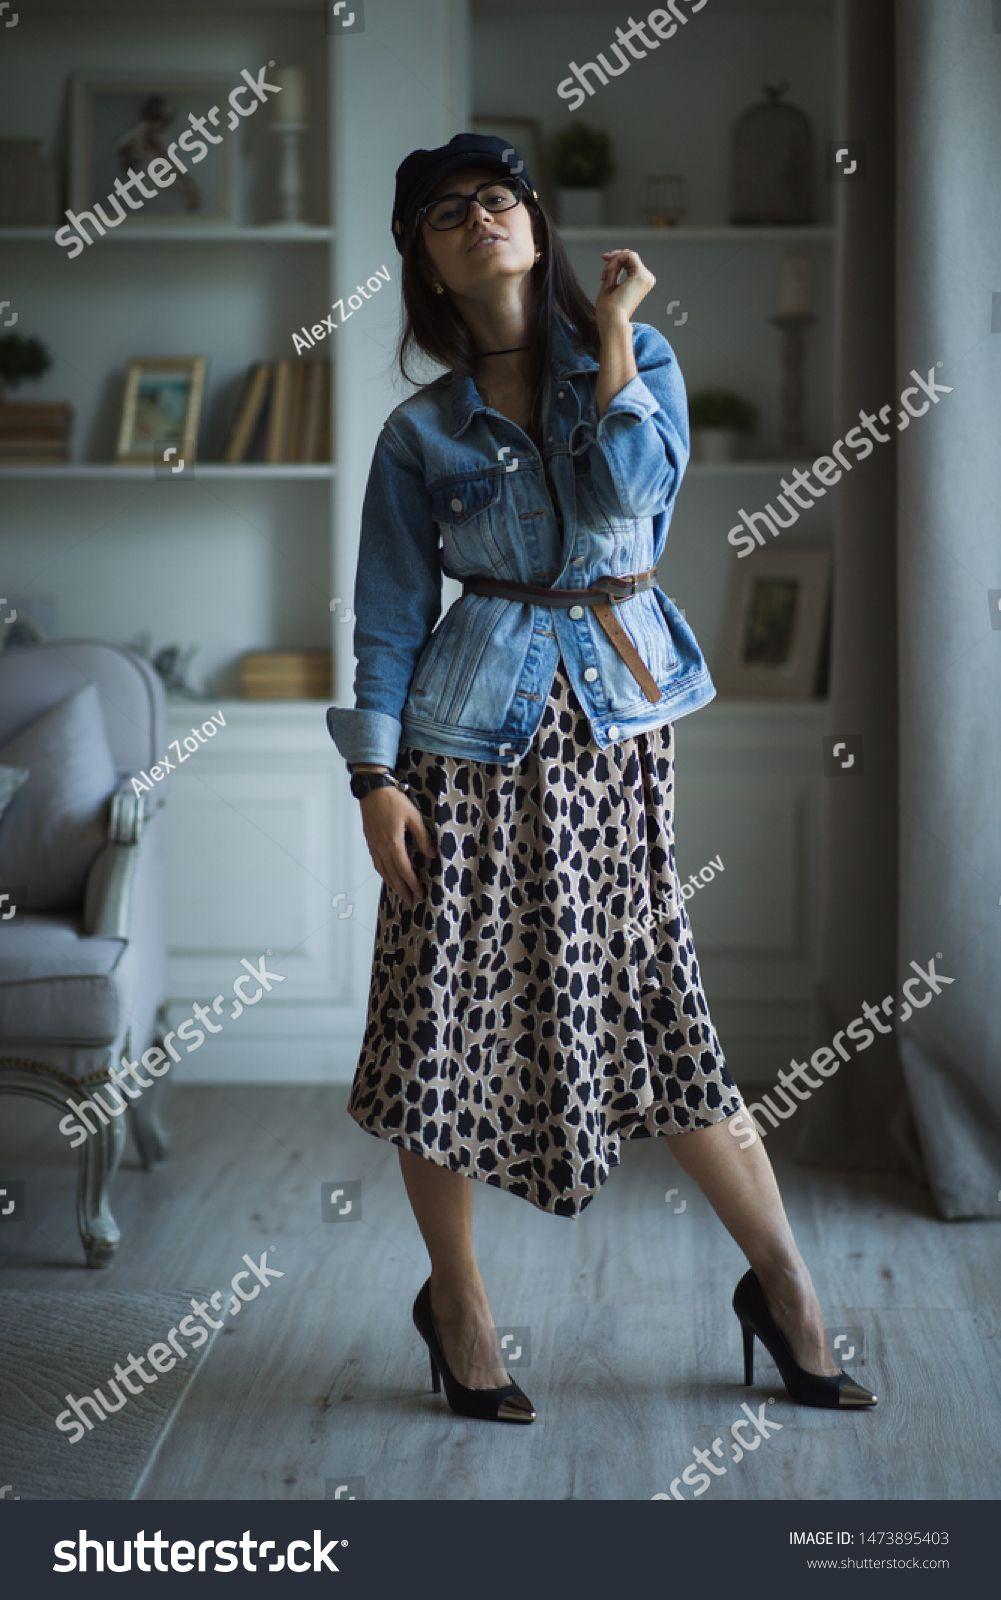 Fashion portrait of young beautiful female model standing in leopard dress in interior studio. Pretty girl with slim figure #Sponsored , #AFFILIATE, #female#model#standing#beautiful